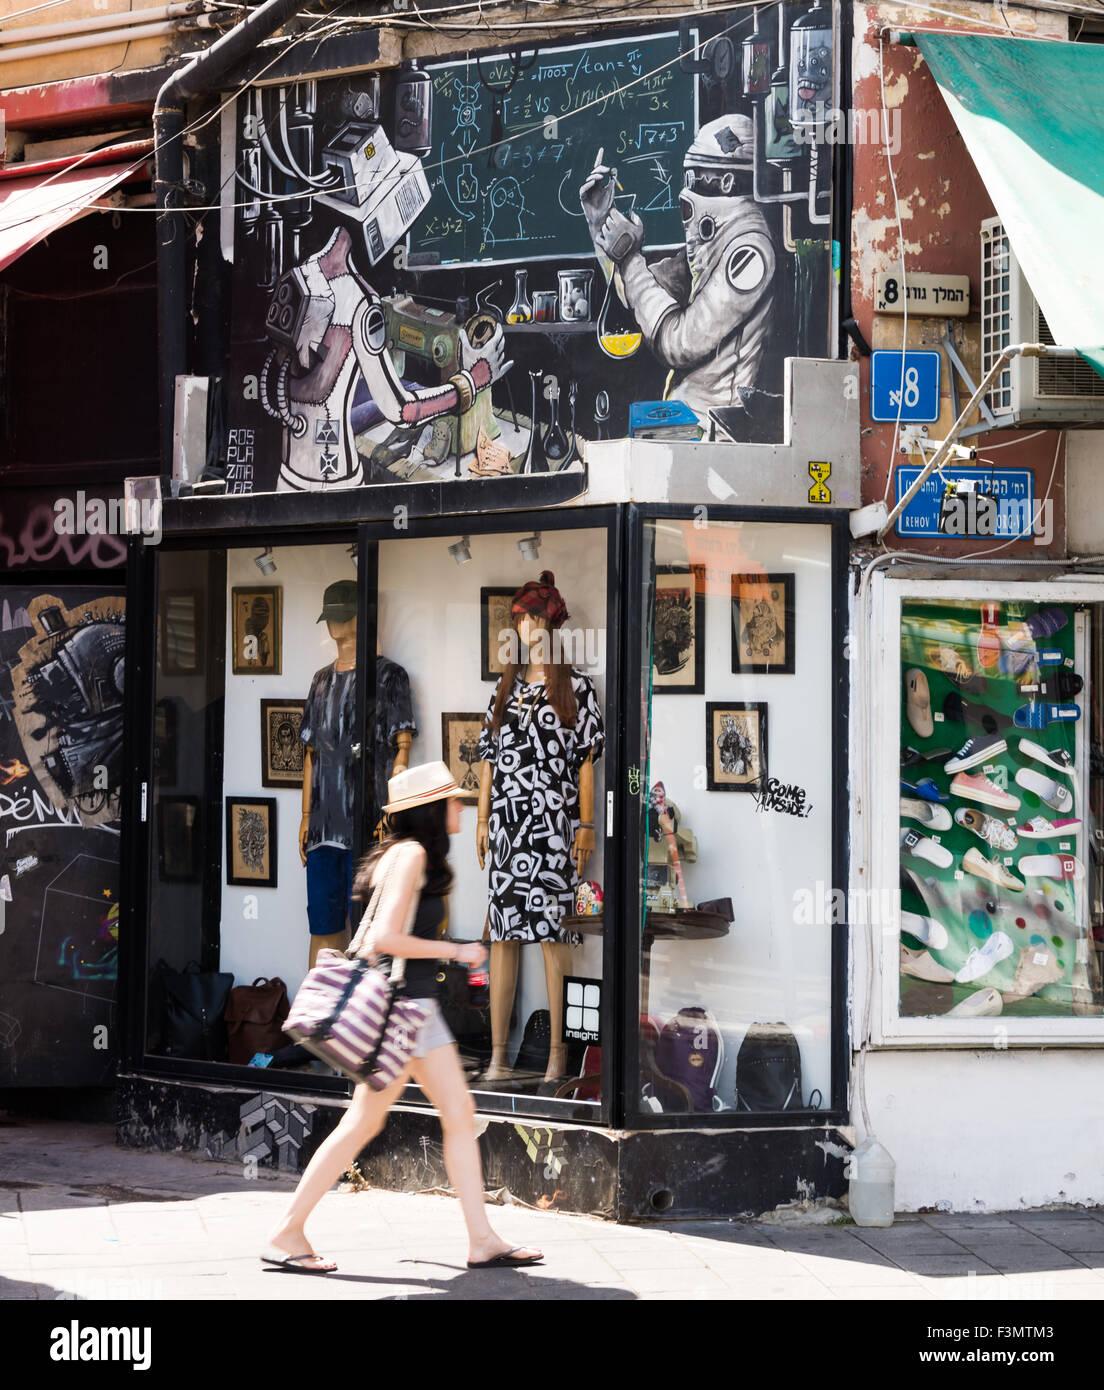 Tel Aviv walks, Israel - Stock Image